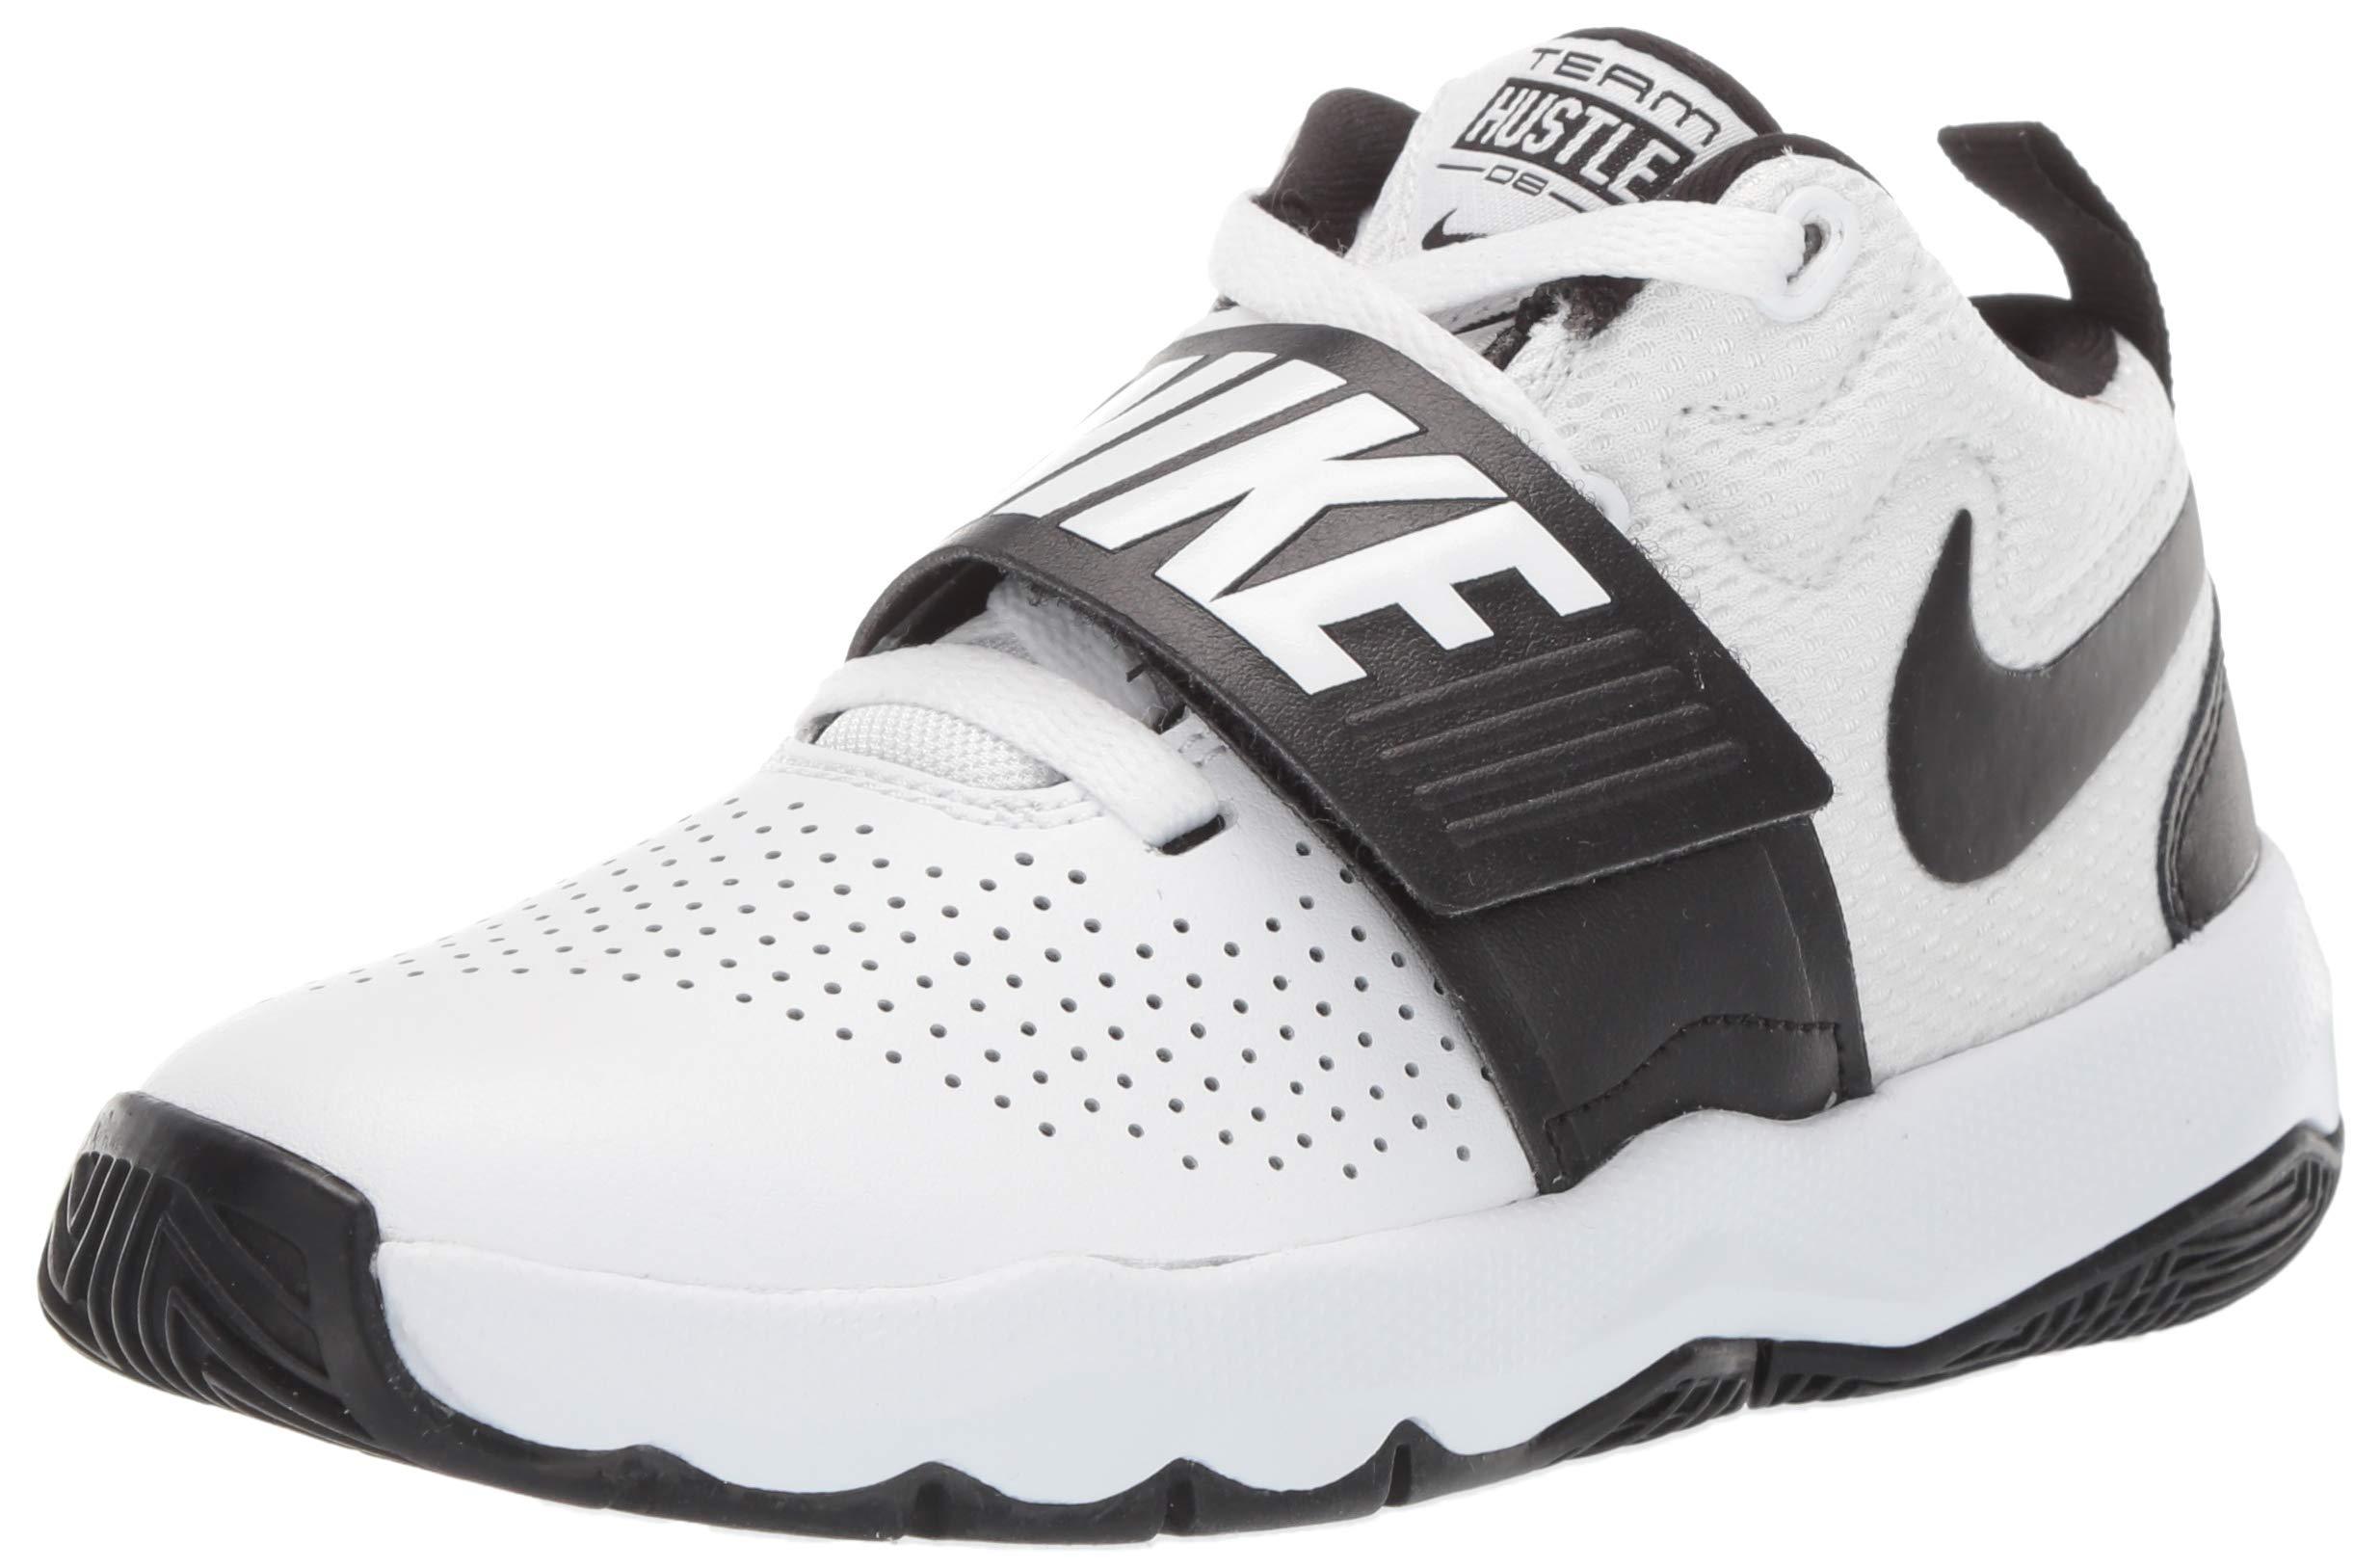 bb4ad93925534 Galleon - Nike Kids' Preschool Team Hustle D 8 Basketball Shoes (13K,  Black/Volt-M)